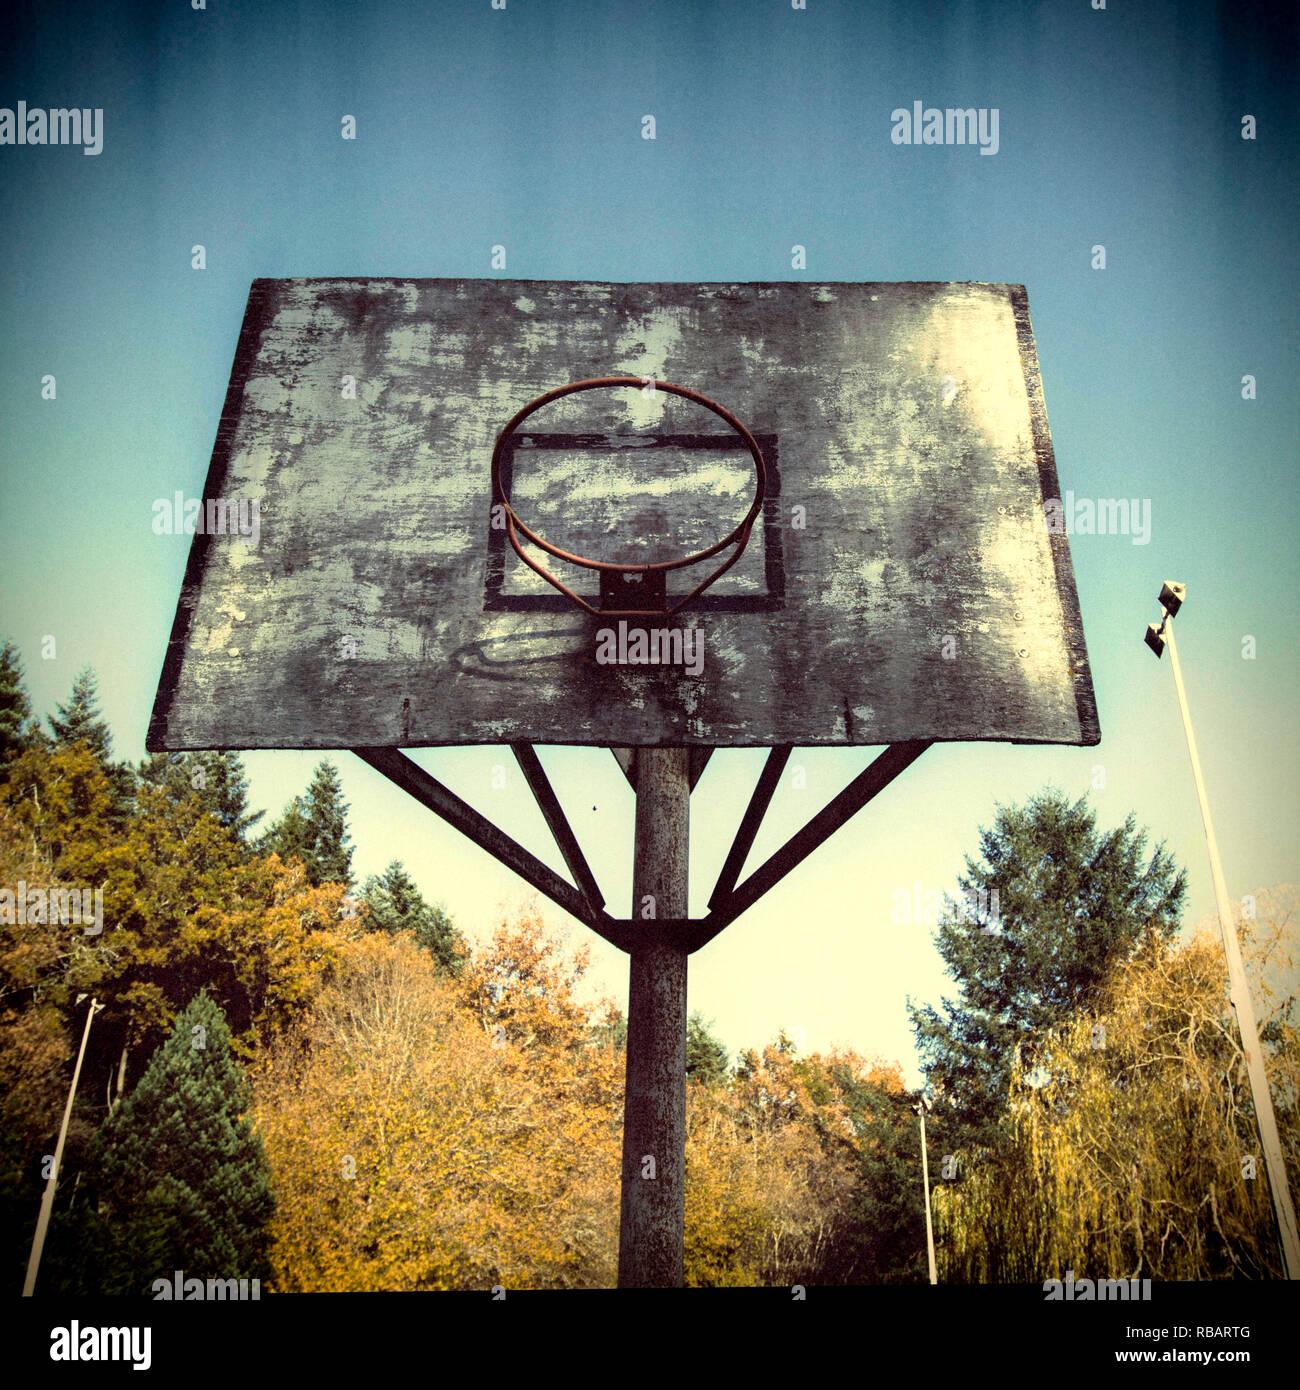 Damaged basketball hoop - Stock Image